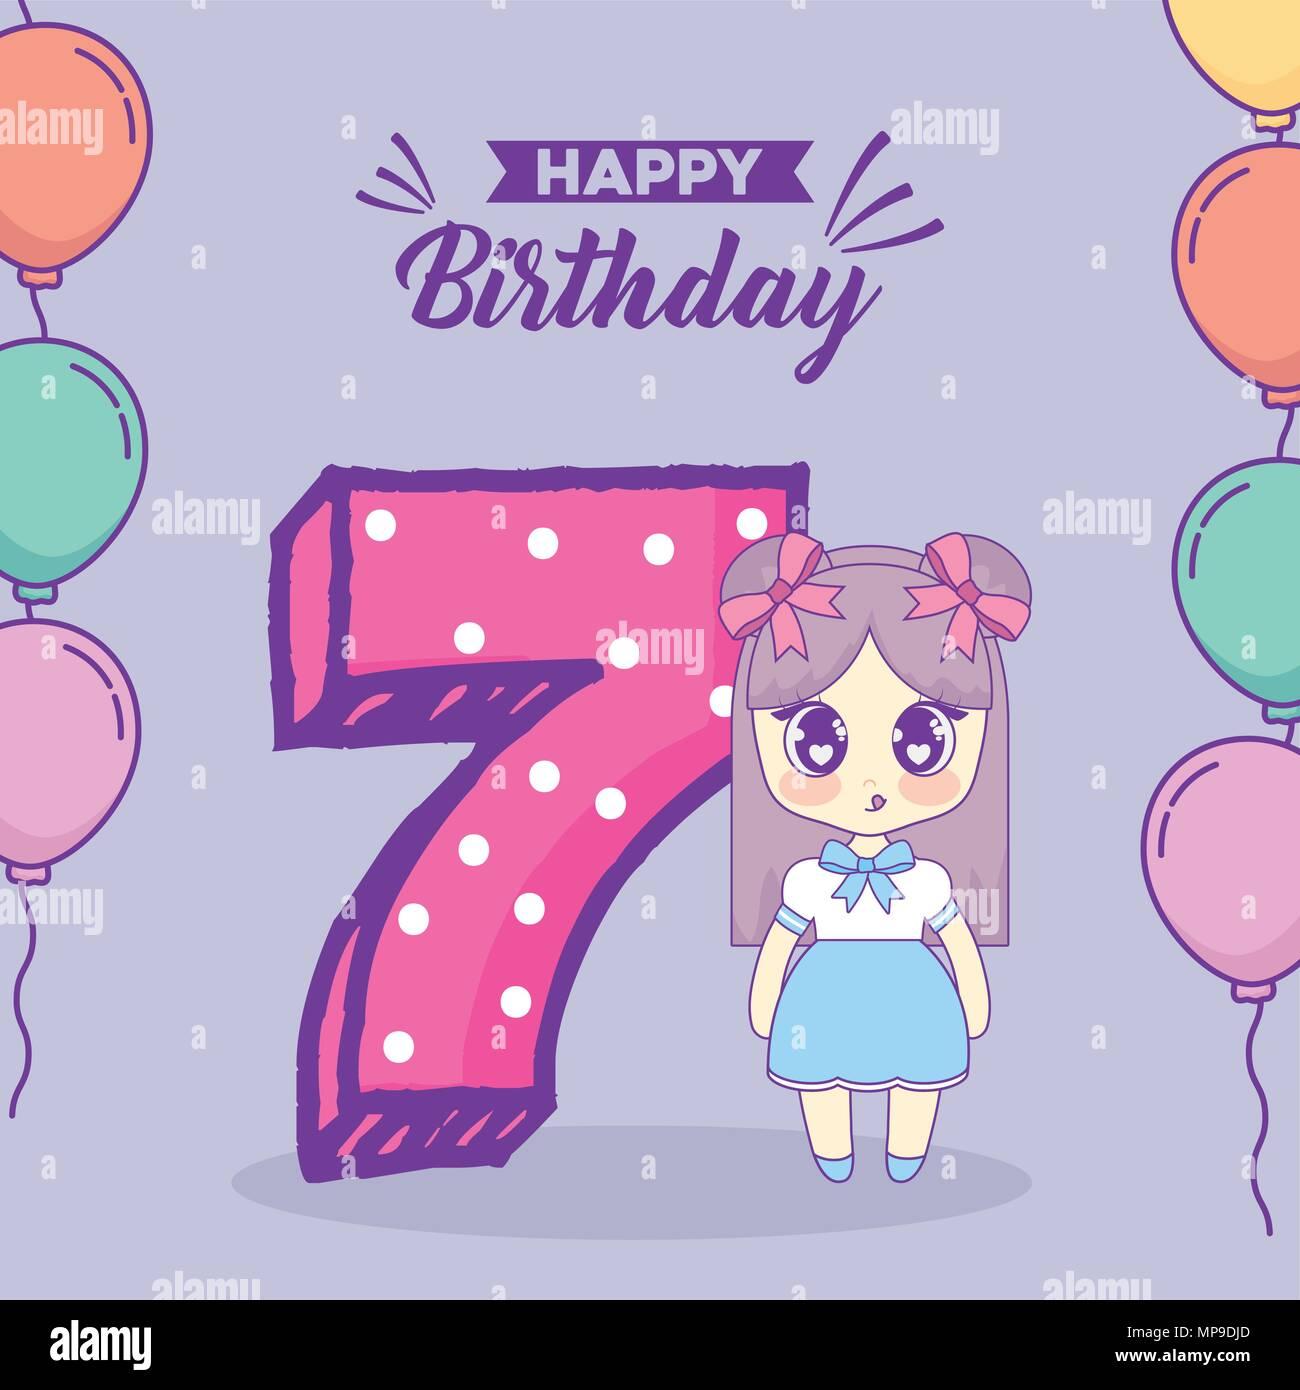 Happy Birthday Design With Kawaii Anime Girl And Number 7